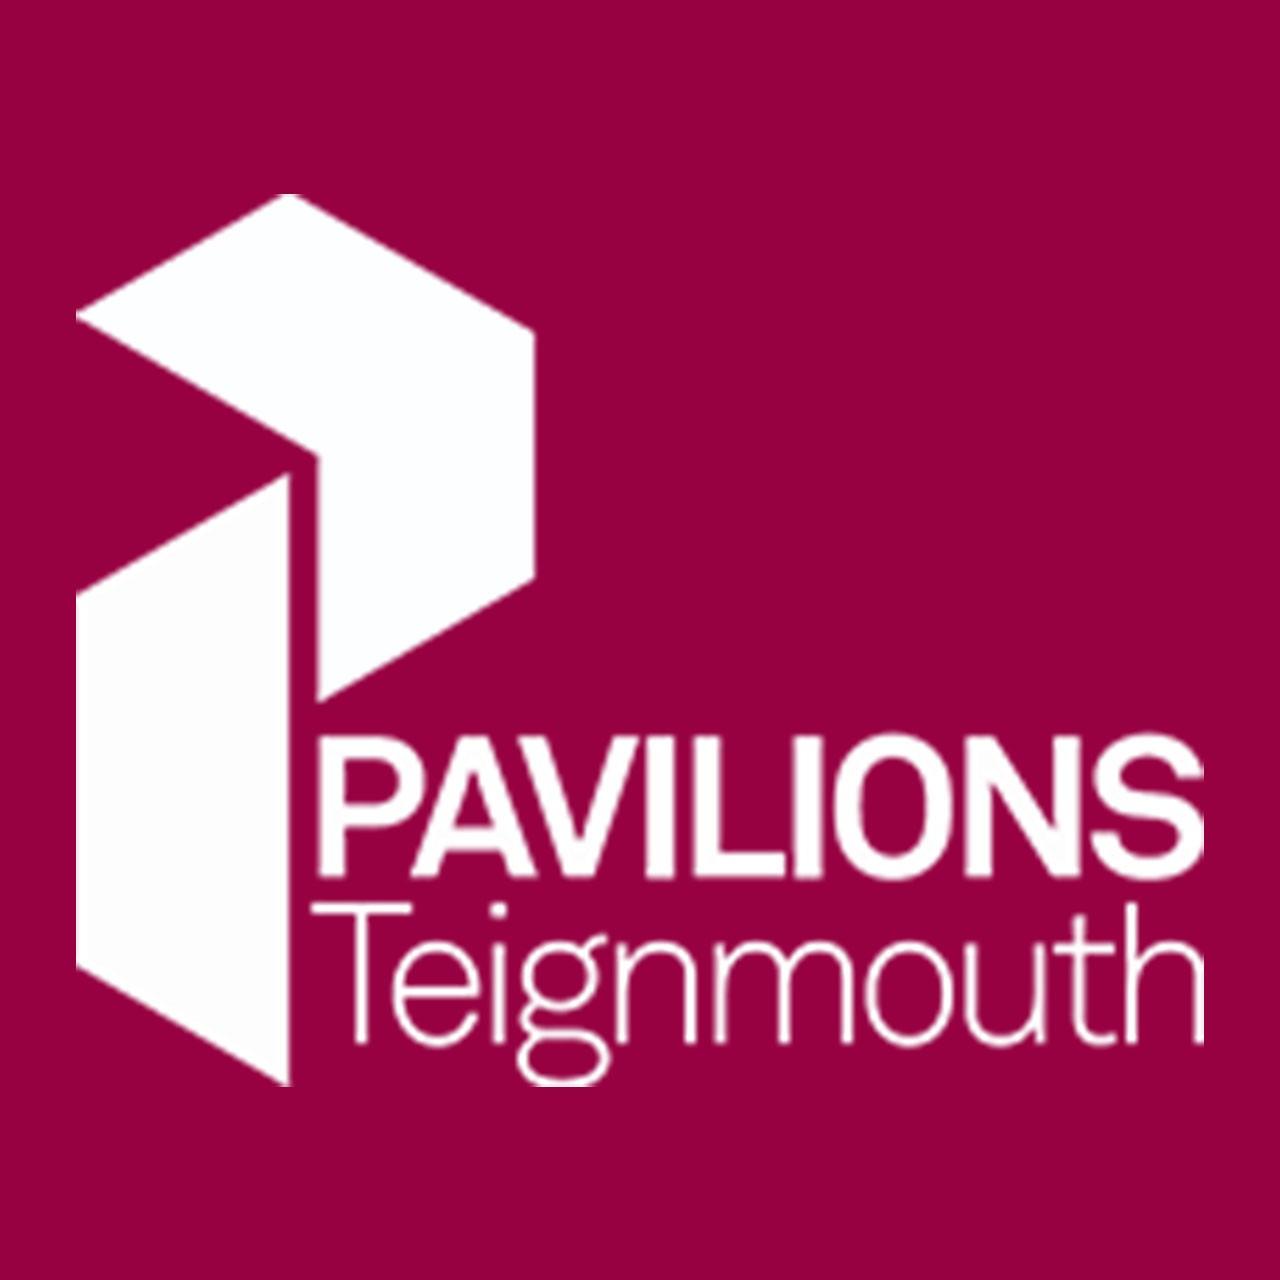 Teignmouth Pavillions